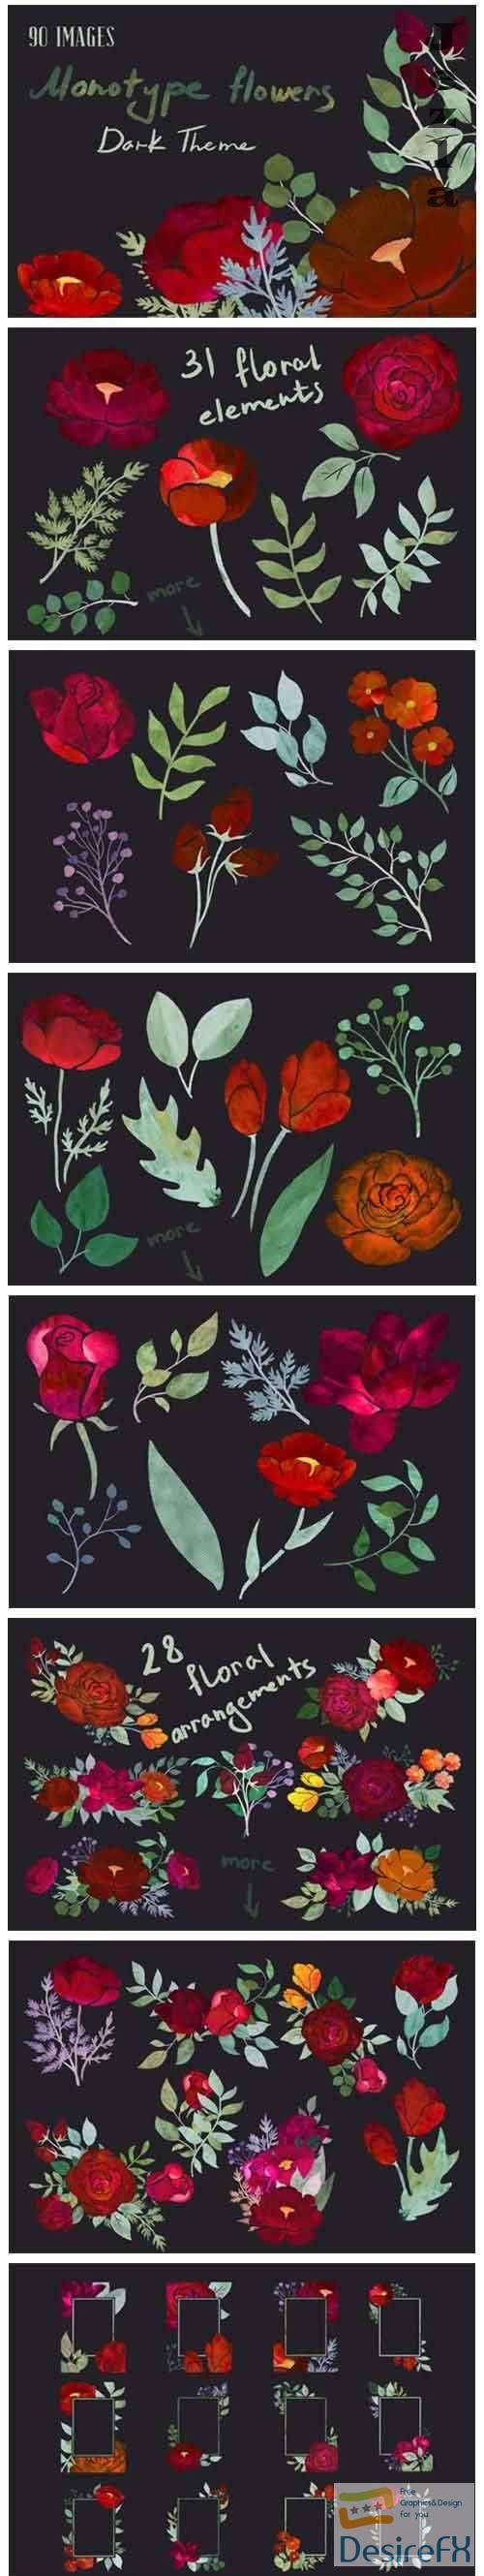 Dark Theme Monotype Flowers - 5024093